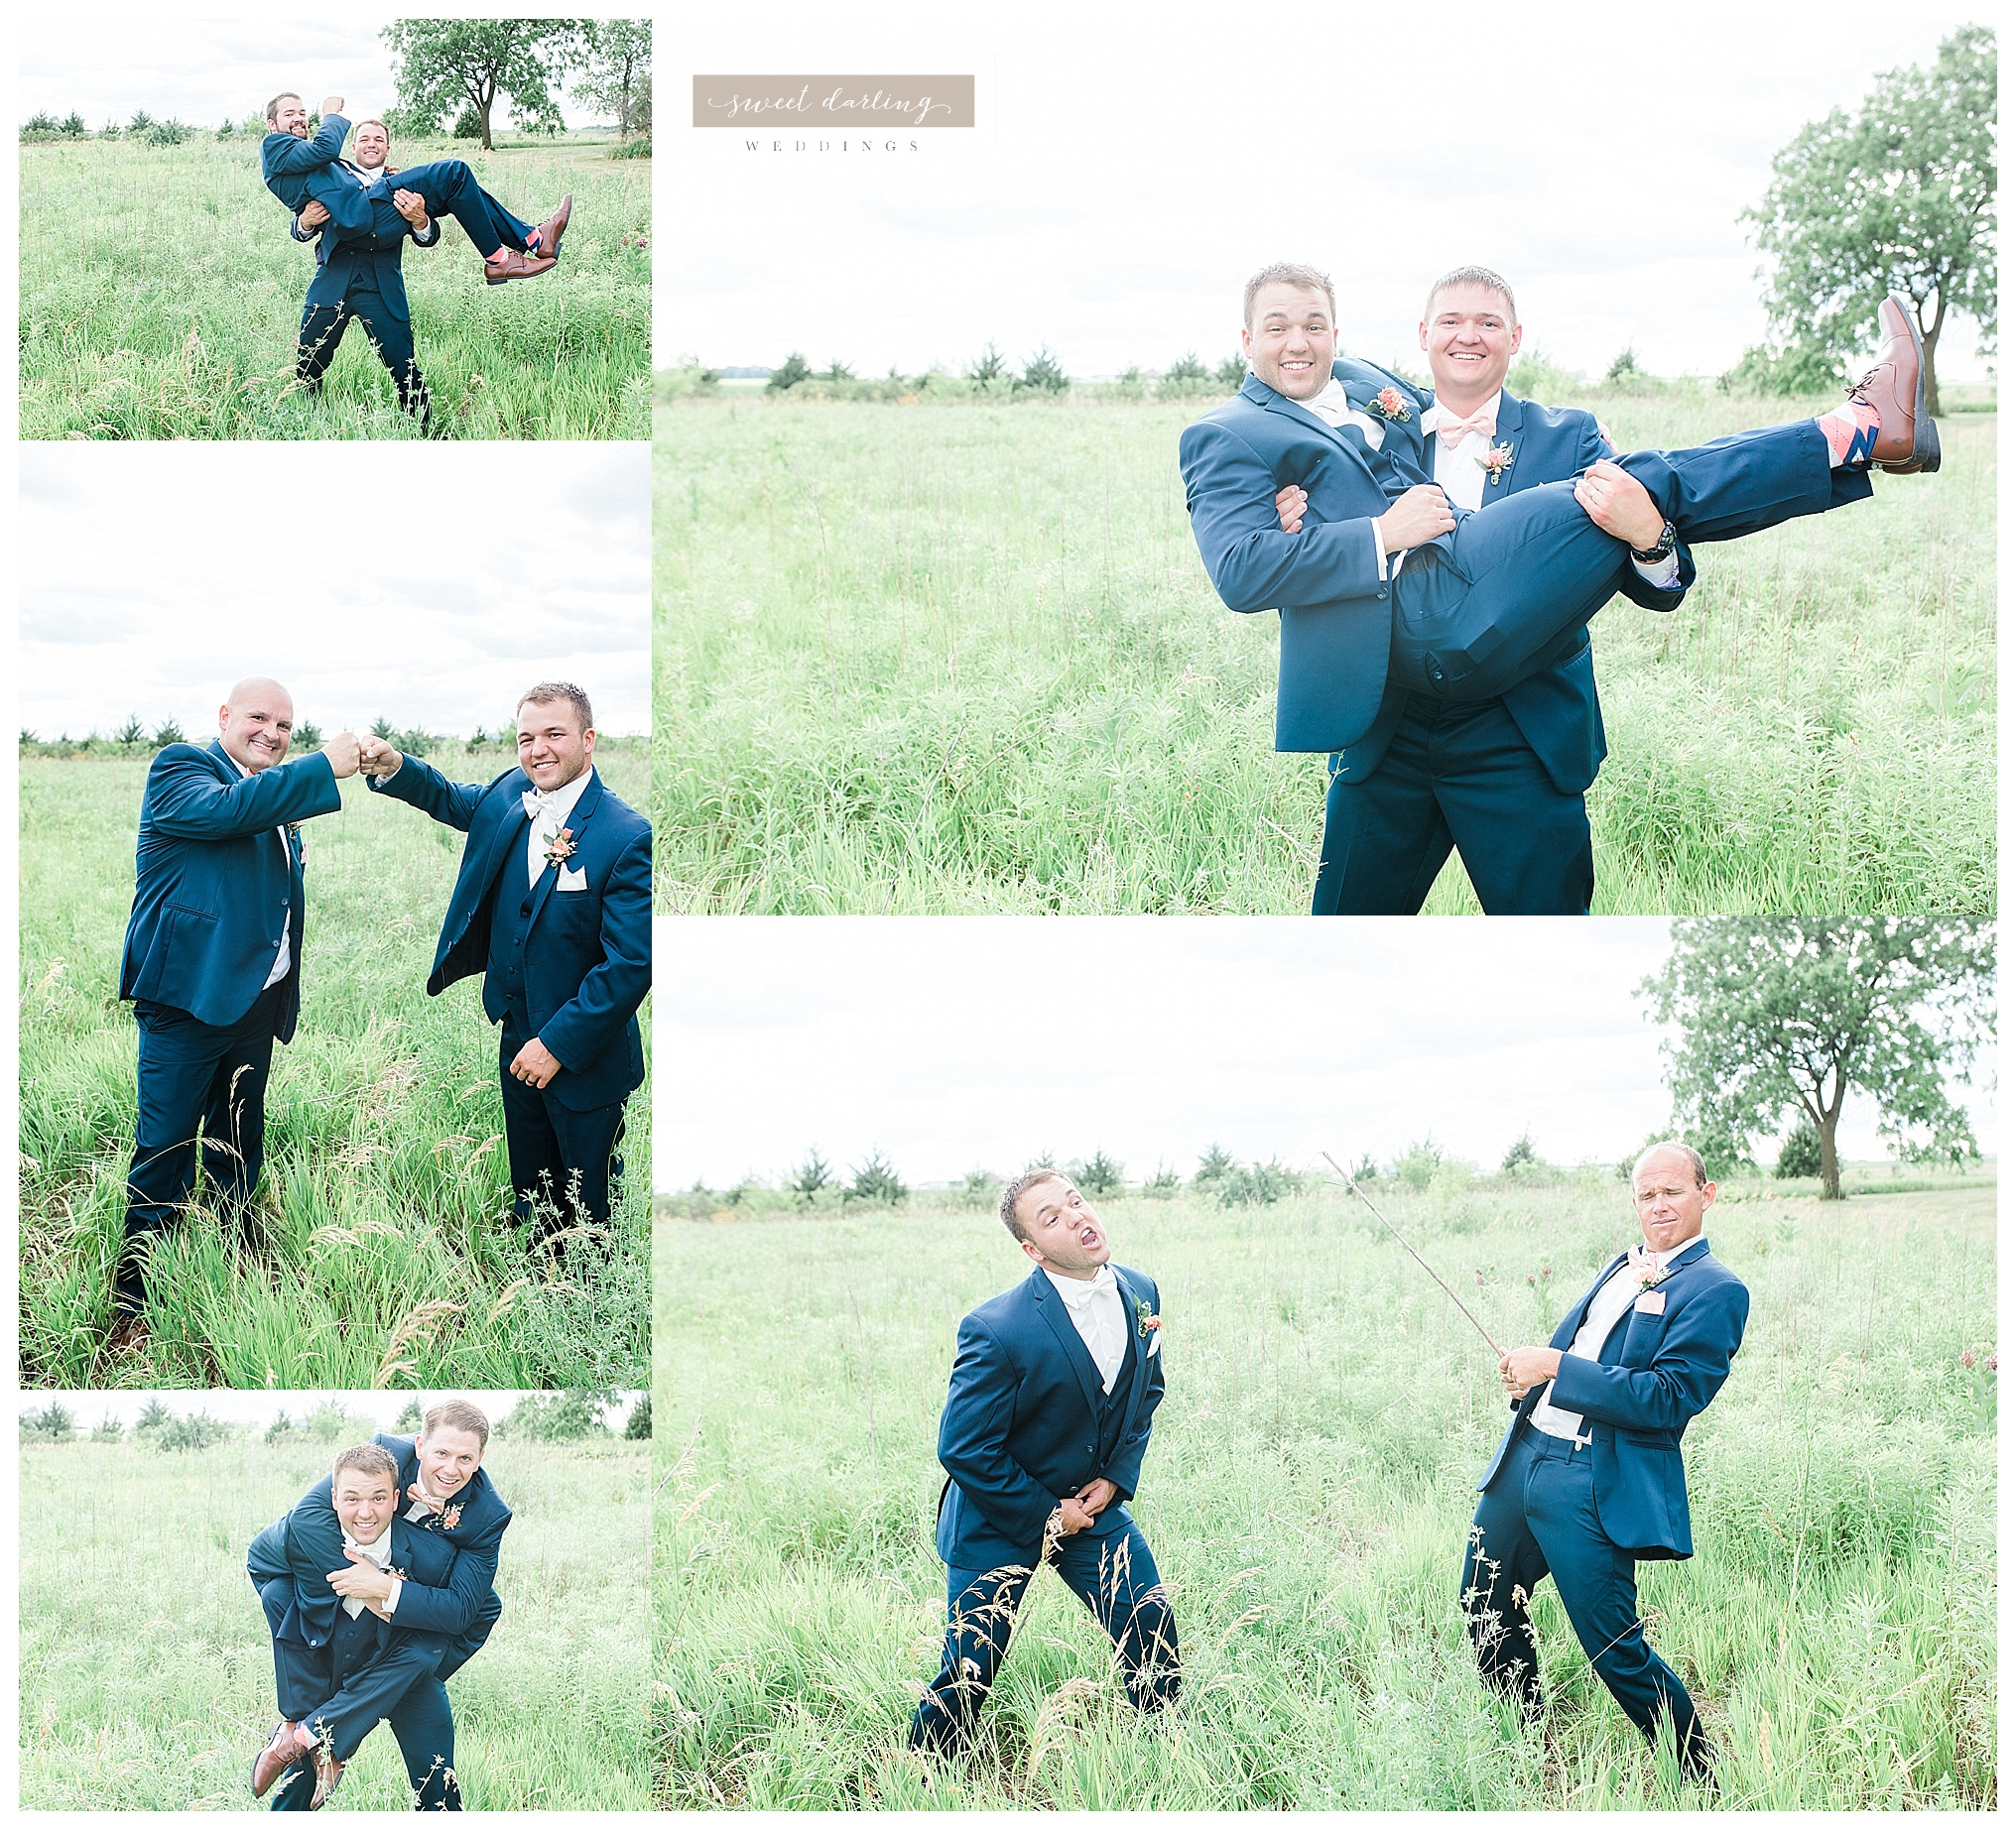 Paxton-illinois-engelbrecht-farmstead-romantic-wedding-photographer-sweet-darling-weddings_1214.jpg